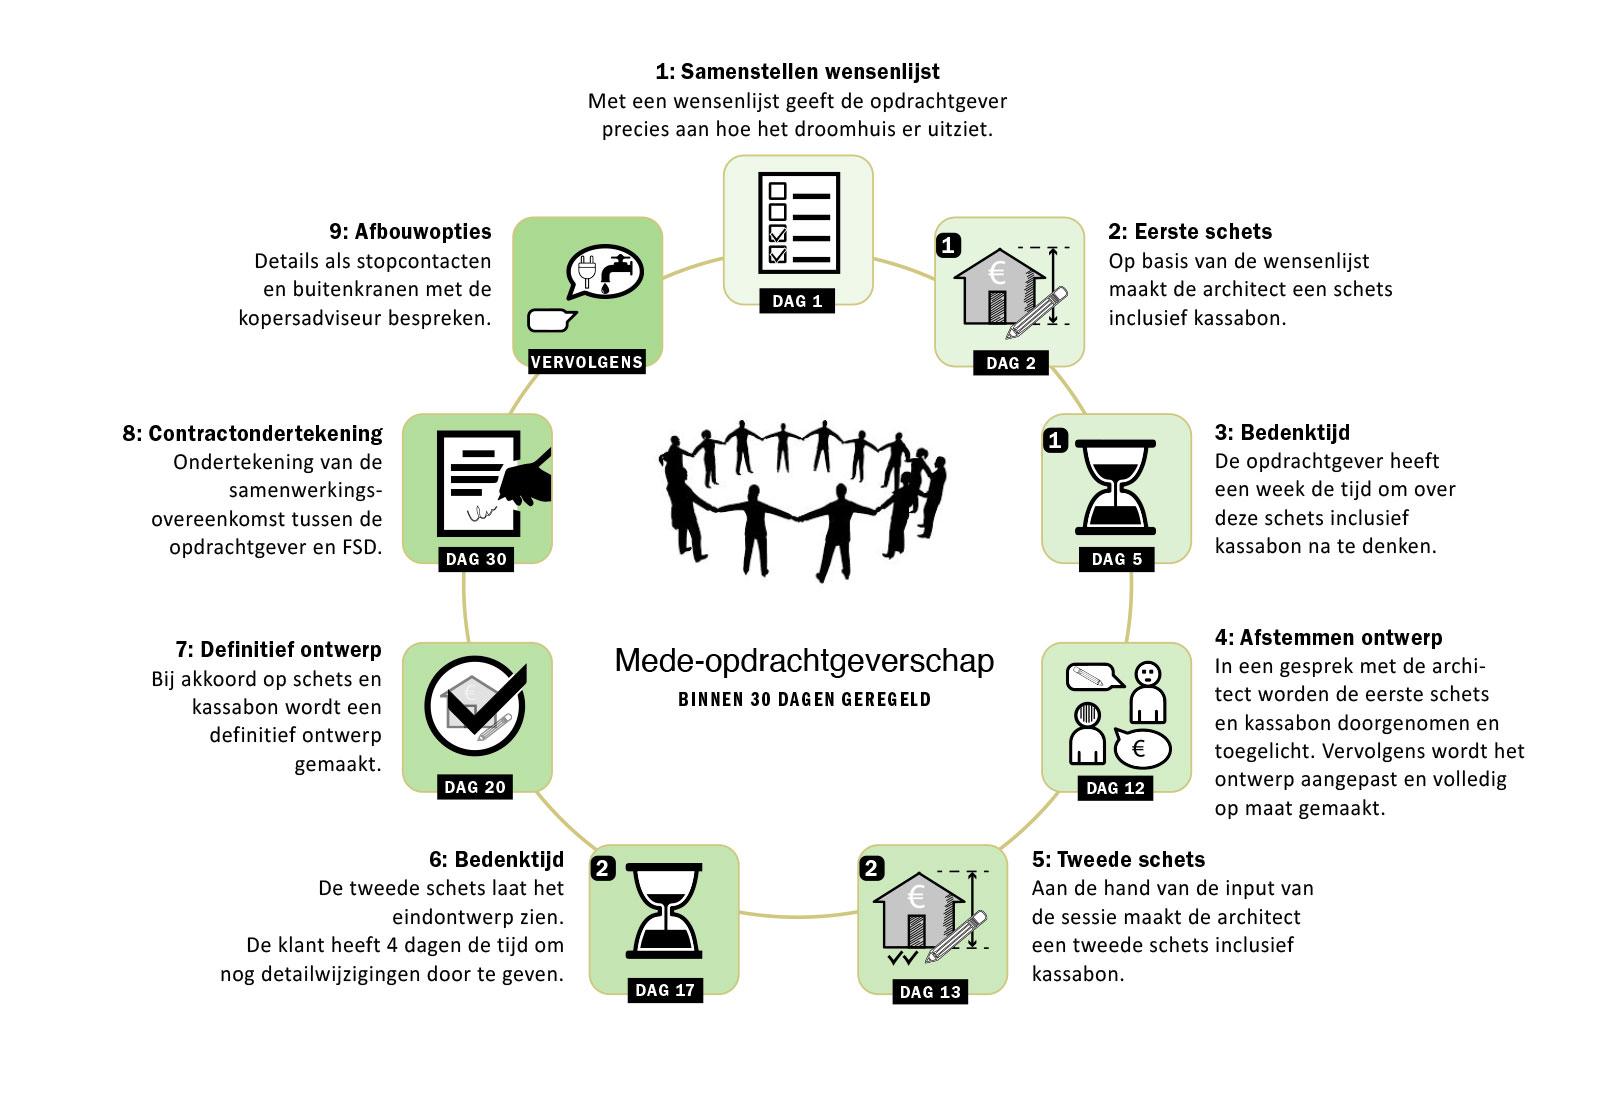 cirkel mede-opdrachtgeverschap